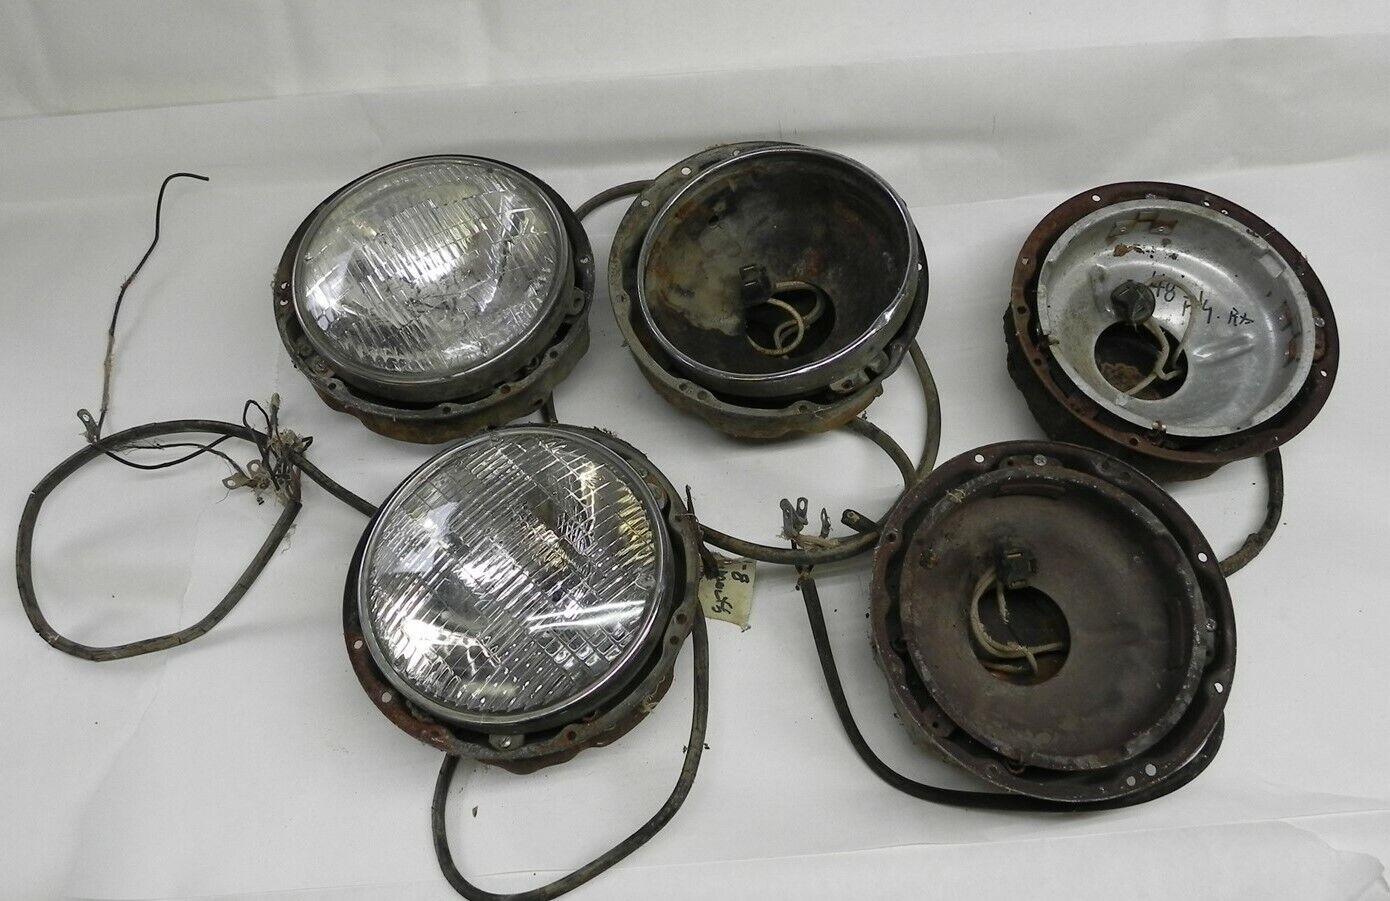 1946-1947-1948 PLYMOUTH MOPAR VINTAGE USED HEAD LIGHT LAMP BUCKET ASSEMBLIES LOT